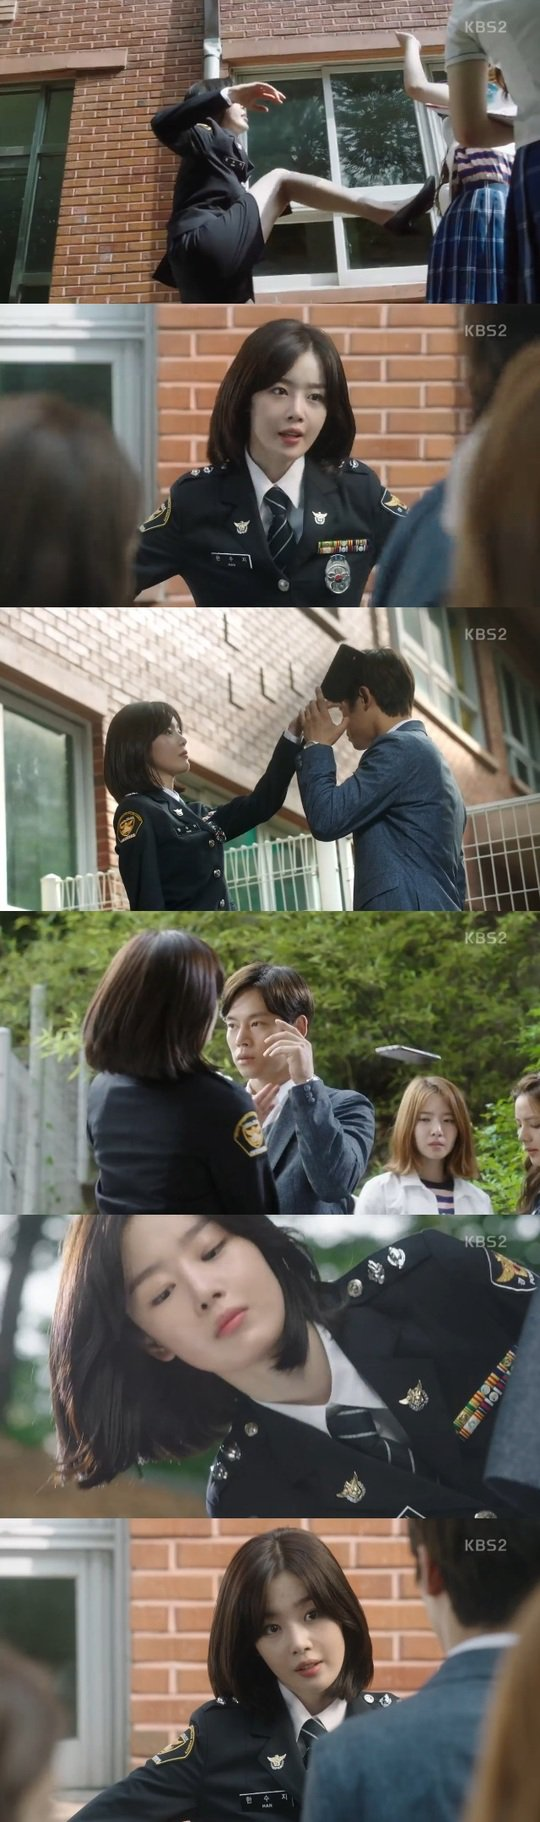 "[Spoiler] ""School 2017"" School policewoman Sunhwa kicks school bullies"